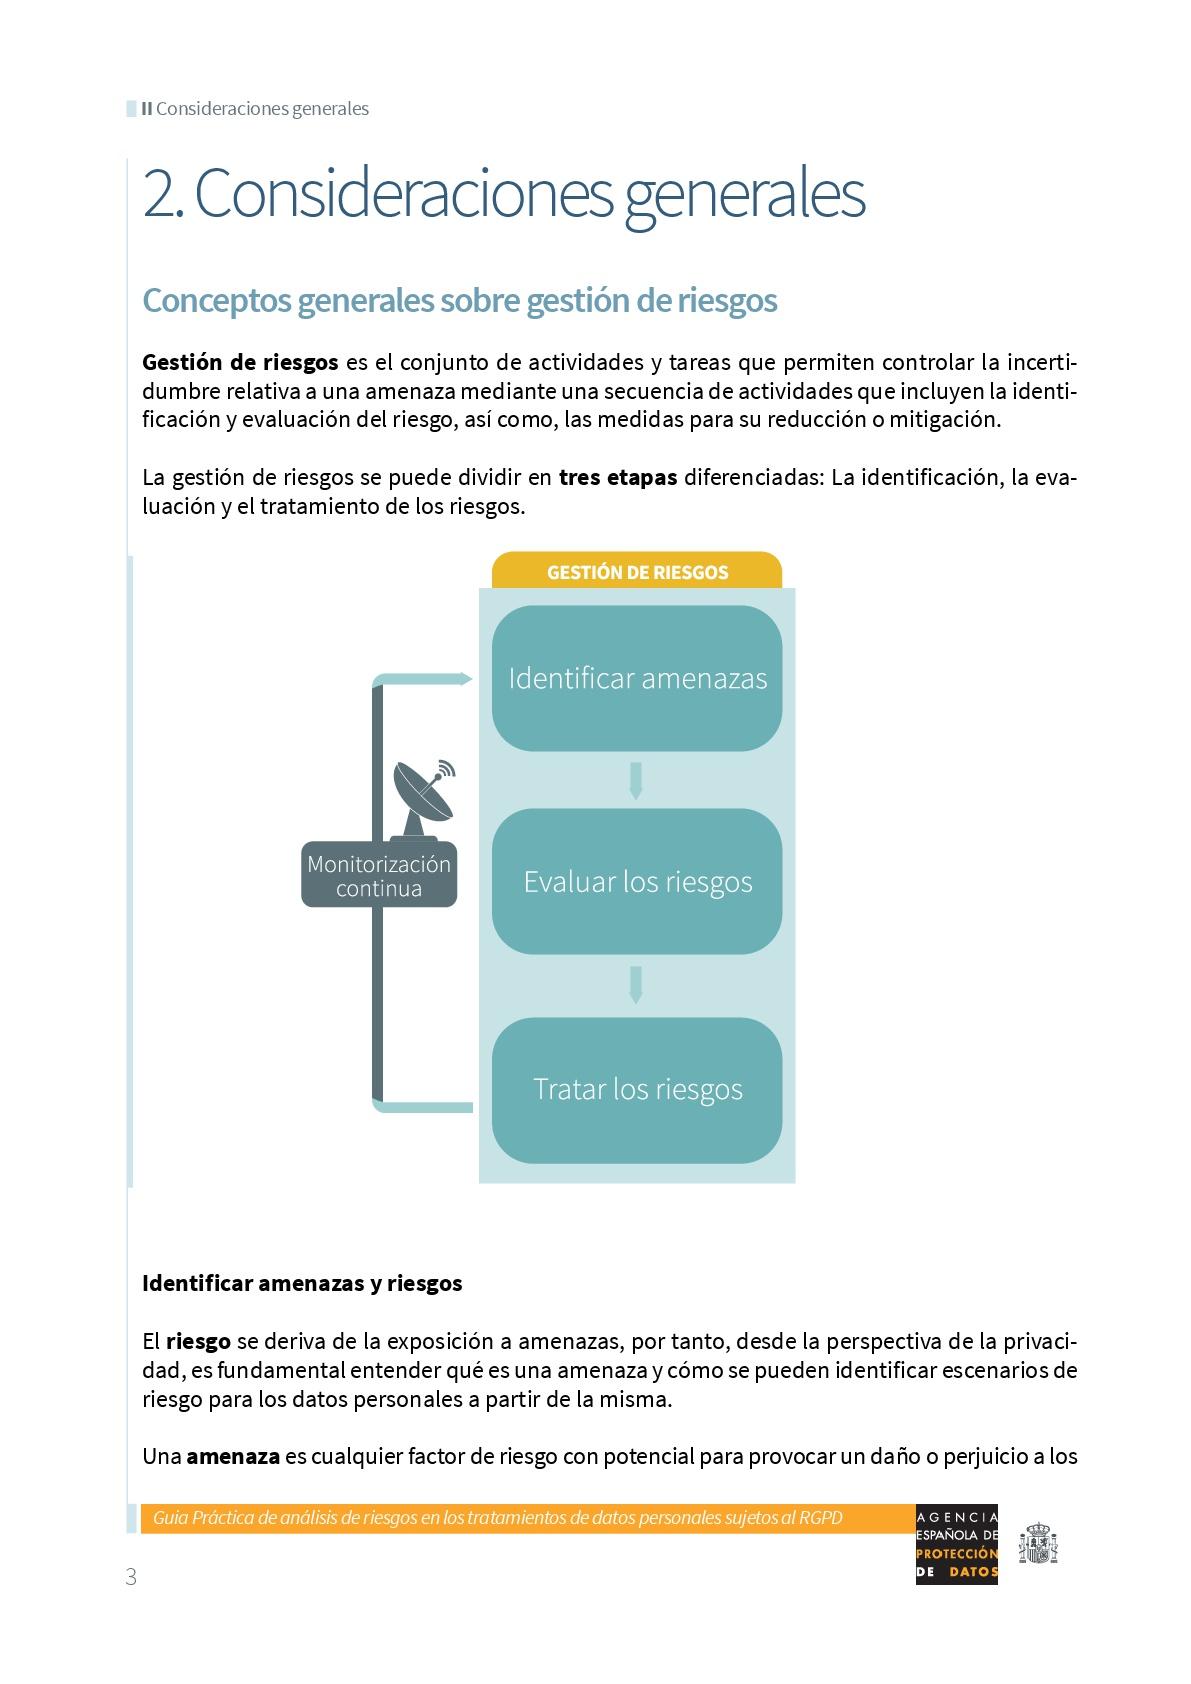 AnalisisDeRiesgosRGPD-004